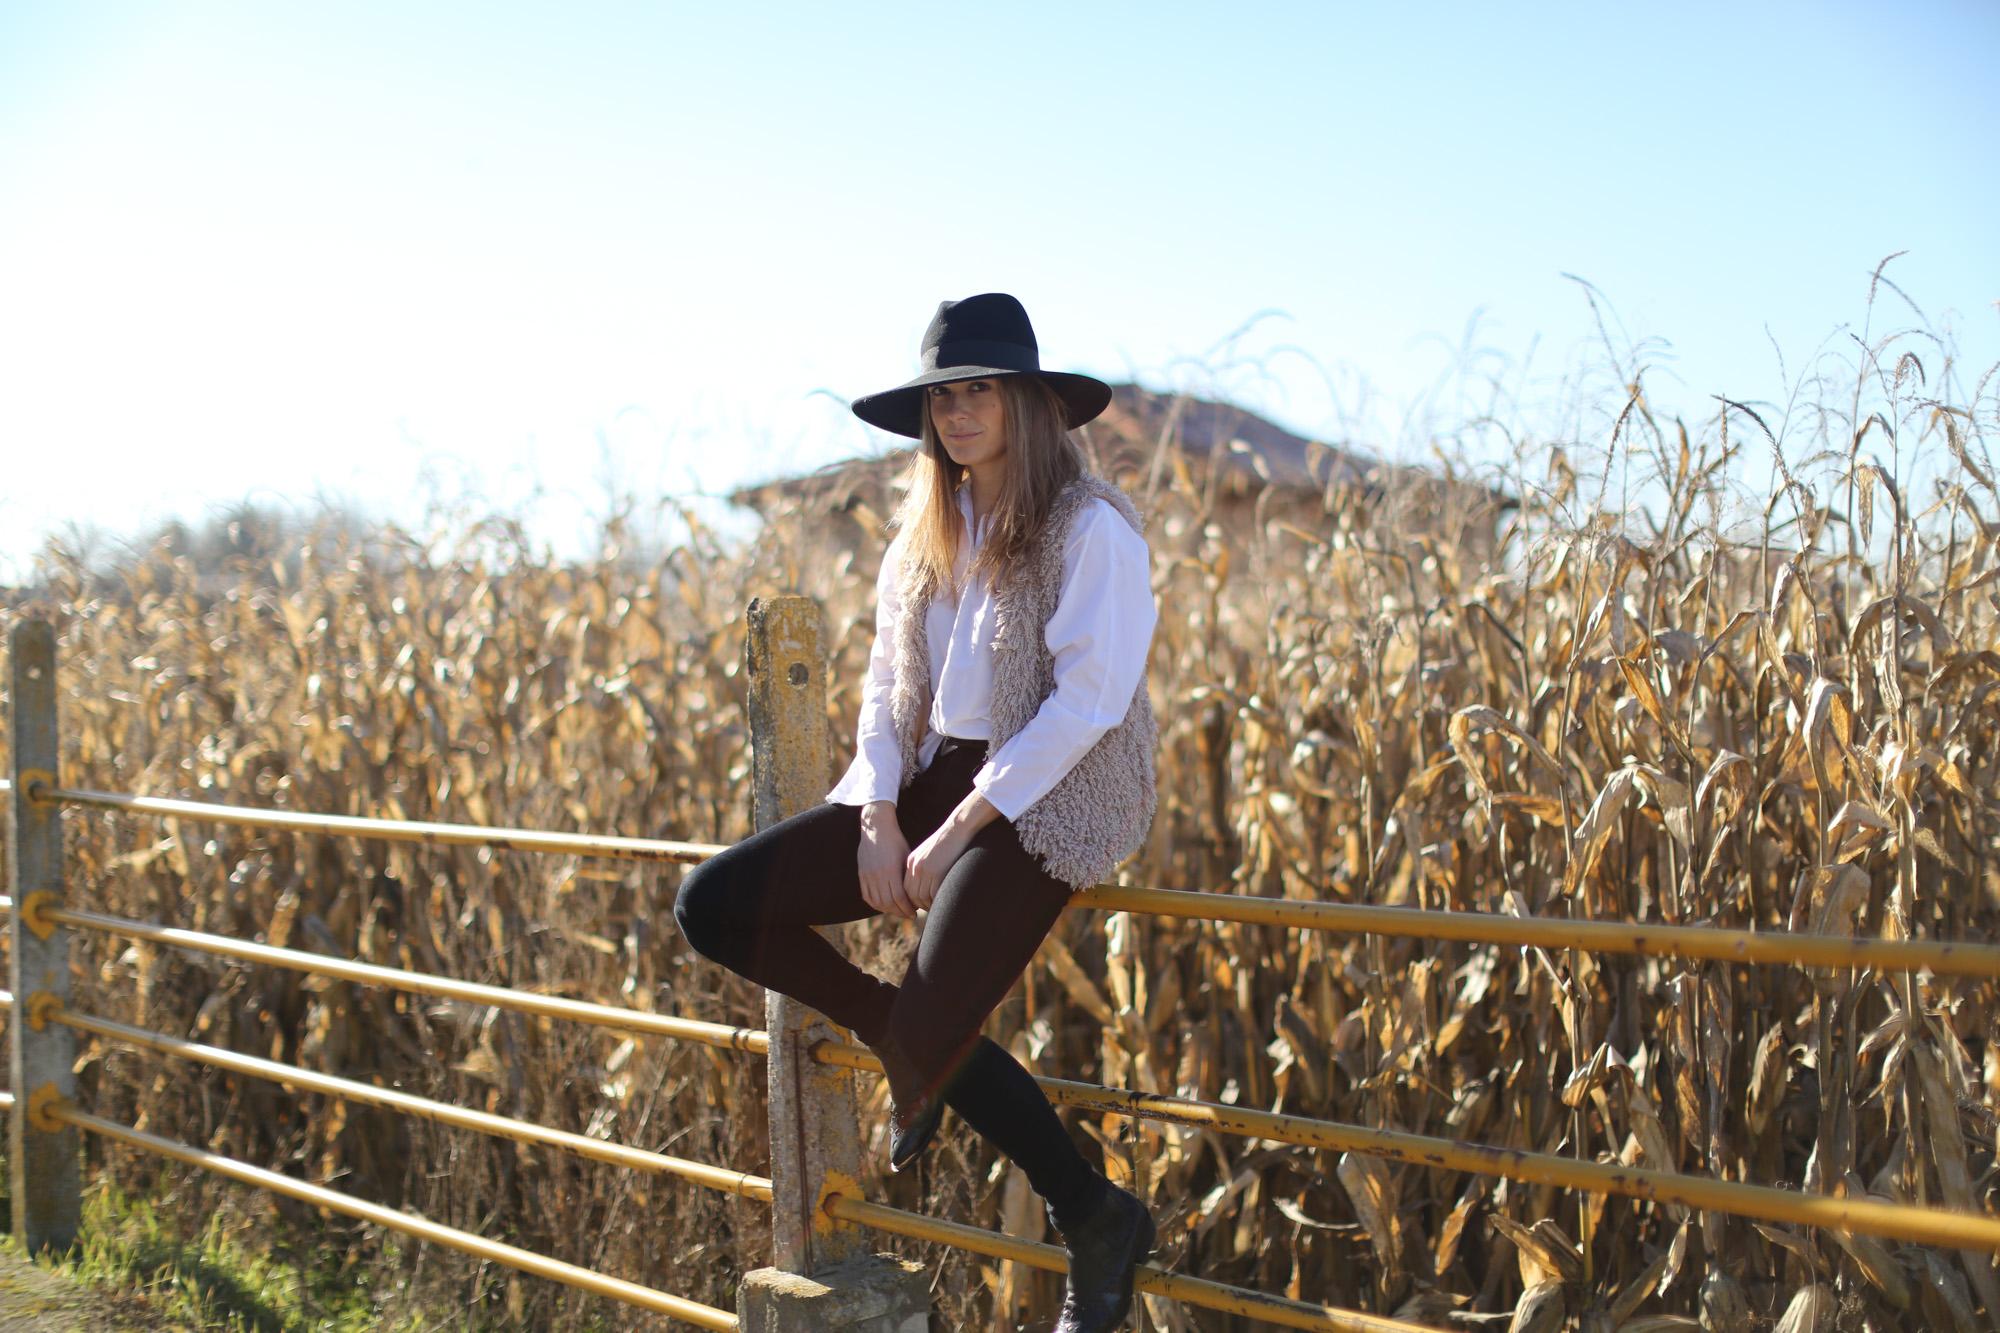 Clochet_streetstyle_cowboy_boots_fedora_hat_waistcoat-1